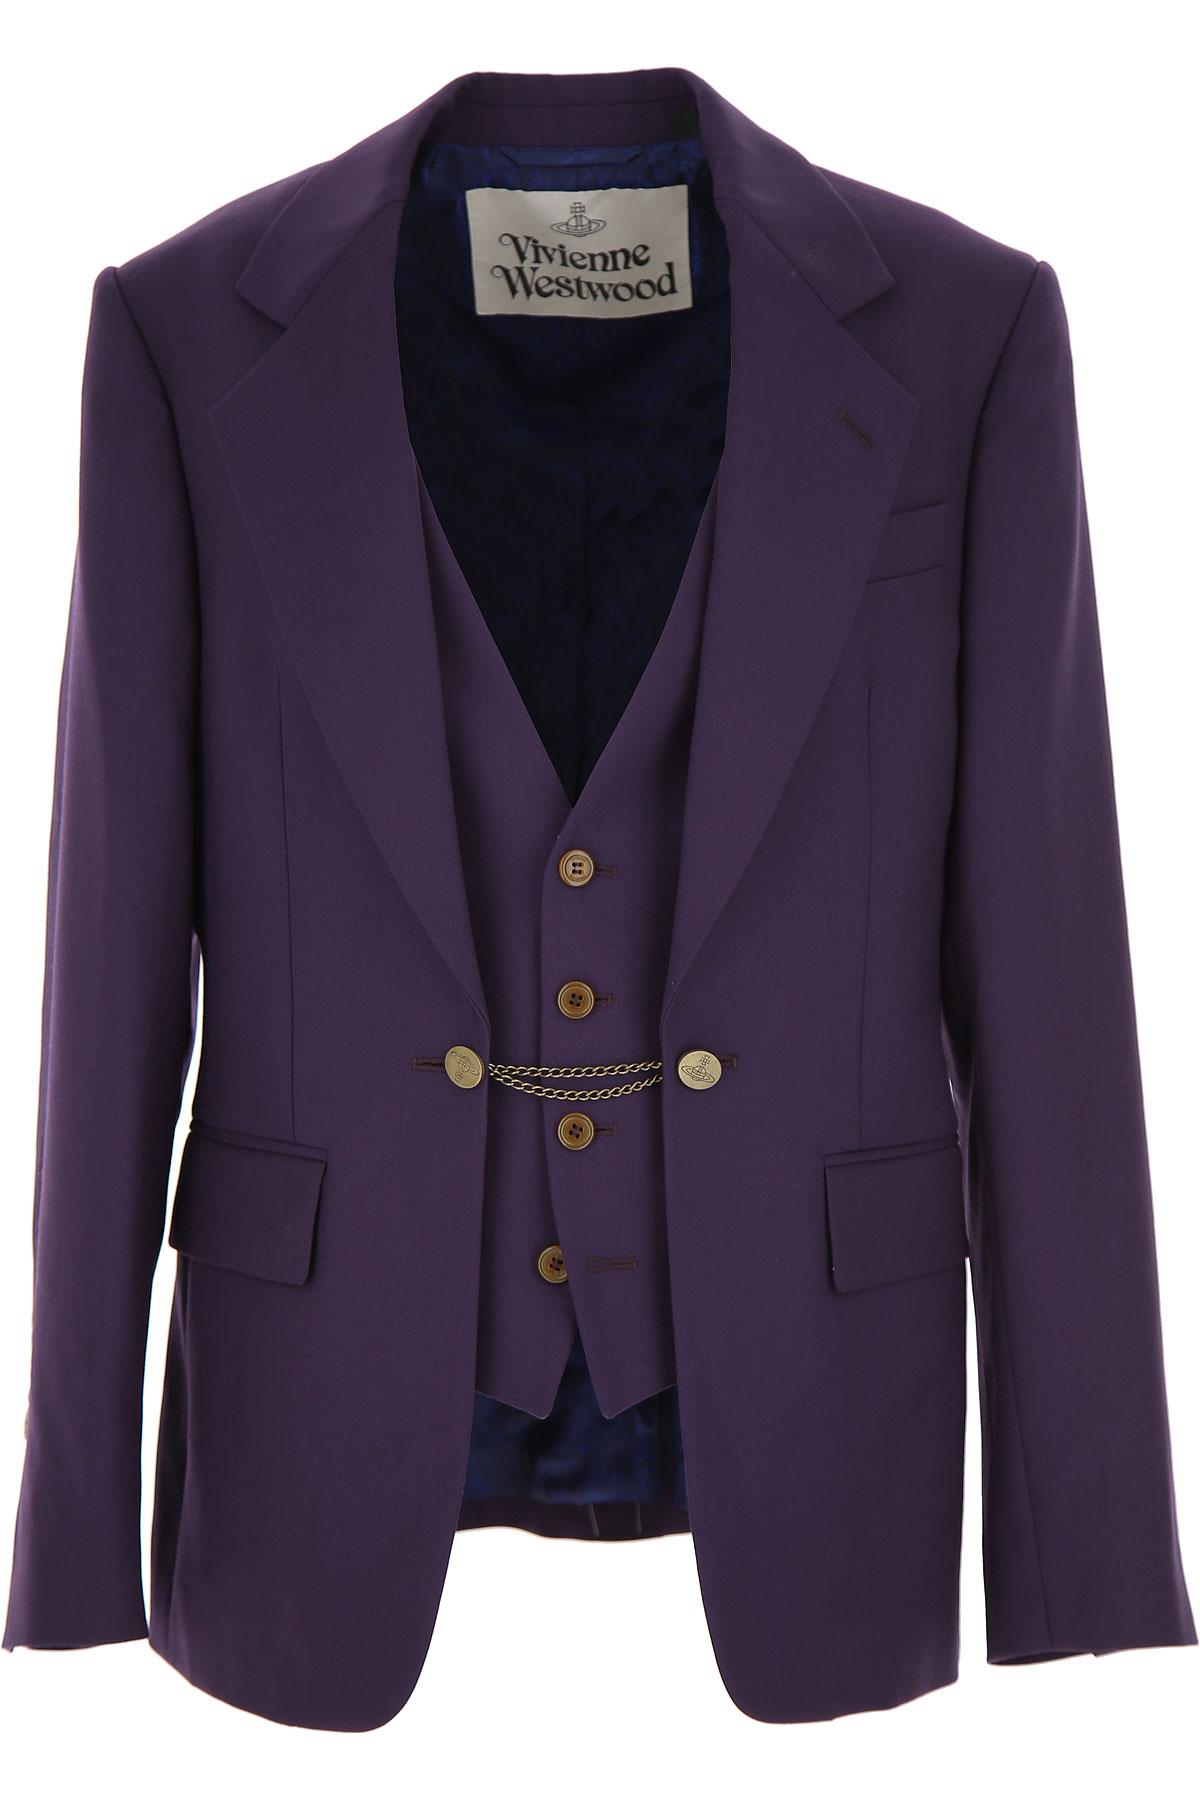 Vivienne Westwood Blazer for Men, Sport Coat, Navy Blue, Wool, 2019, M XXL